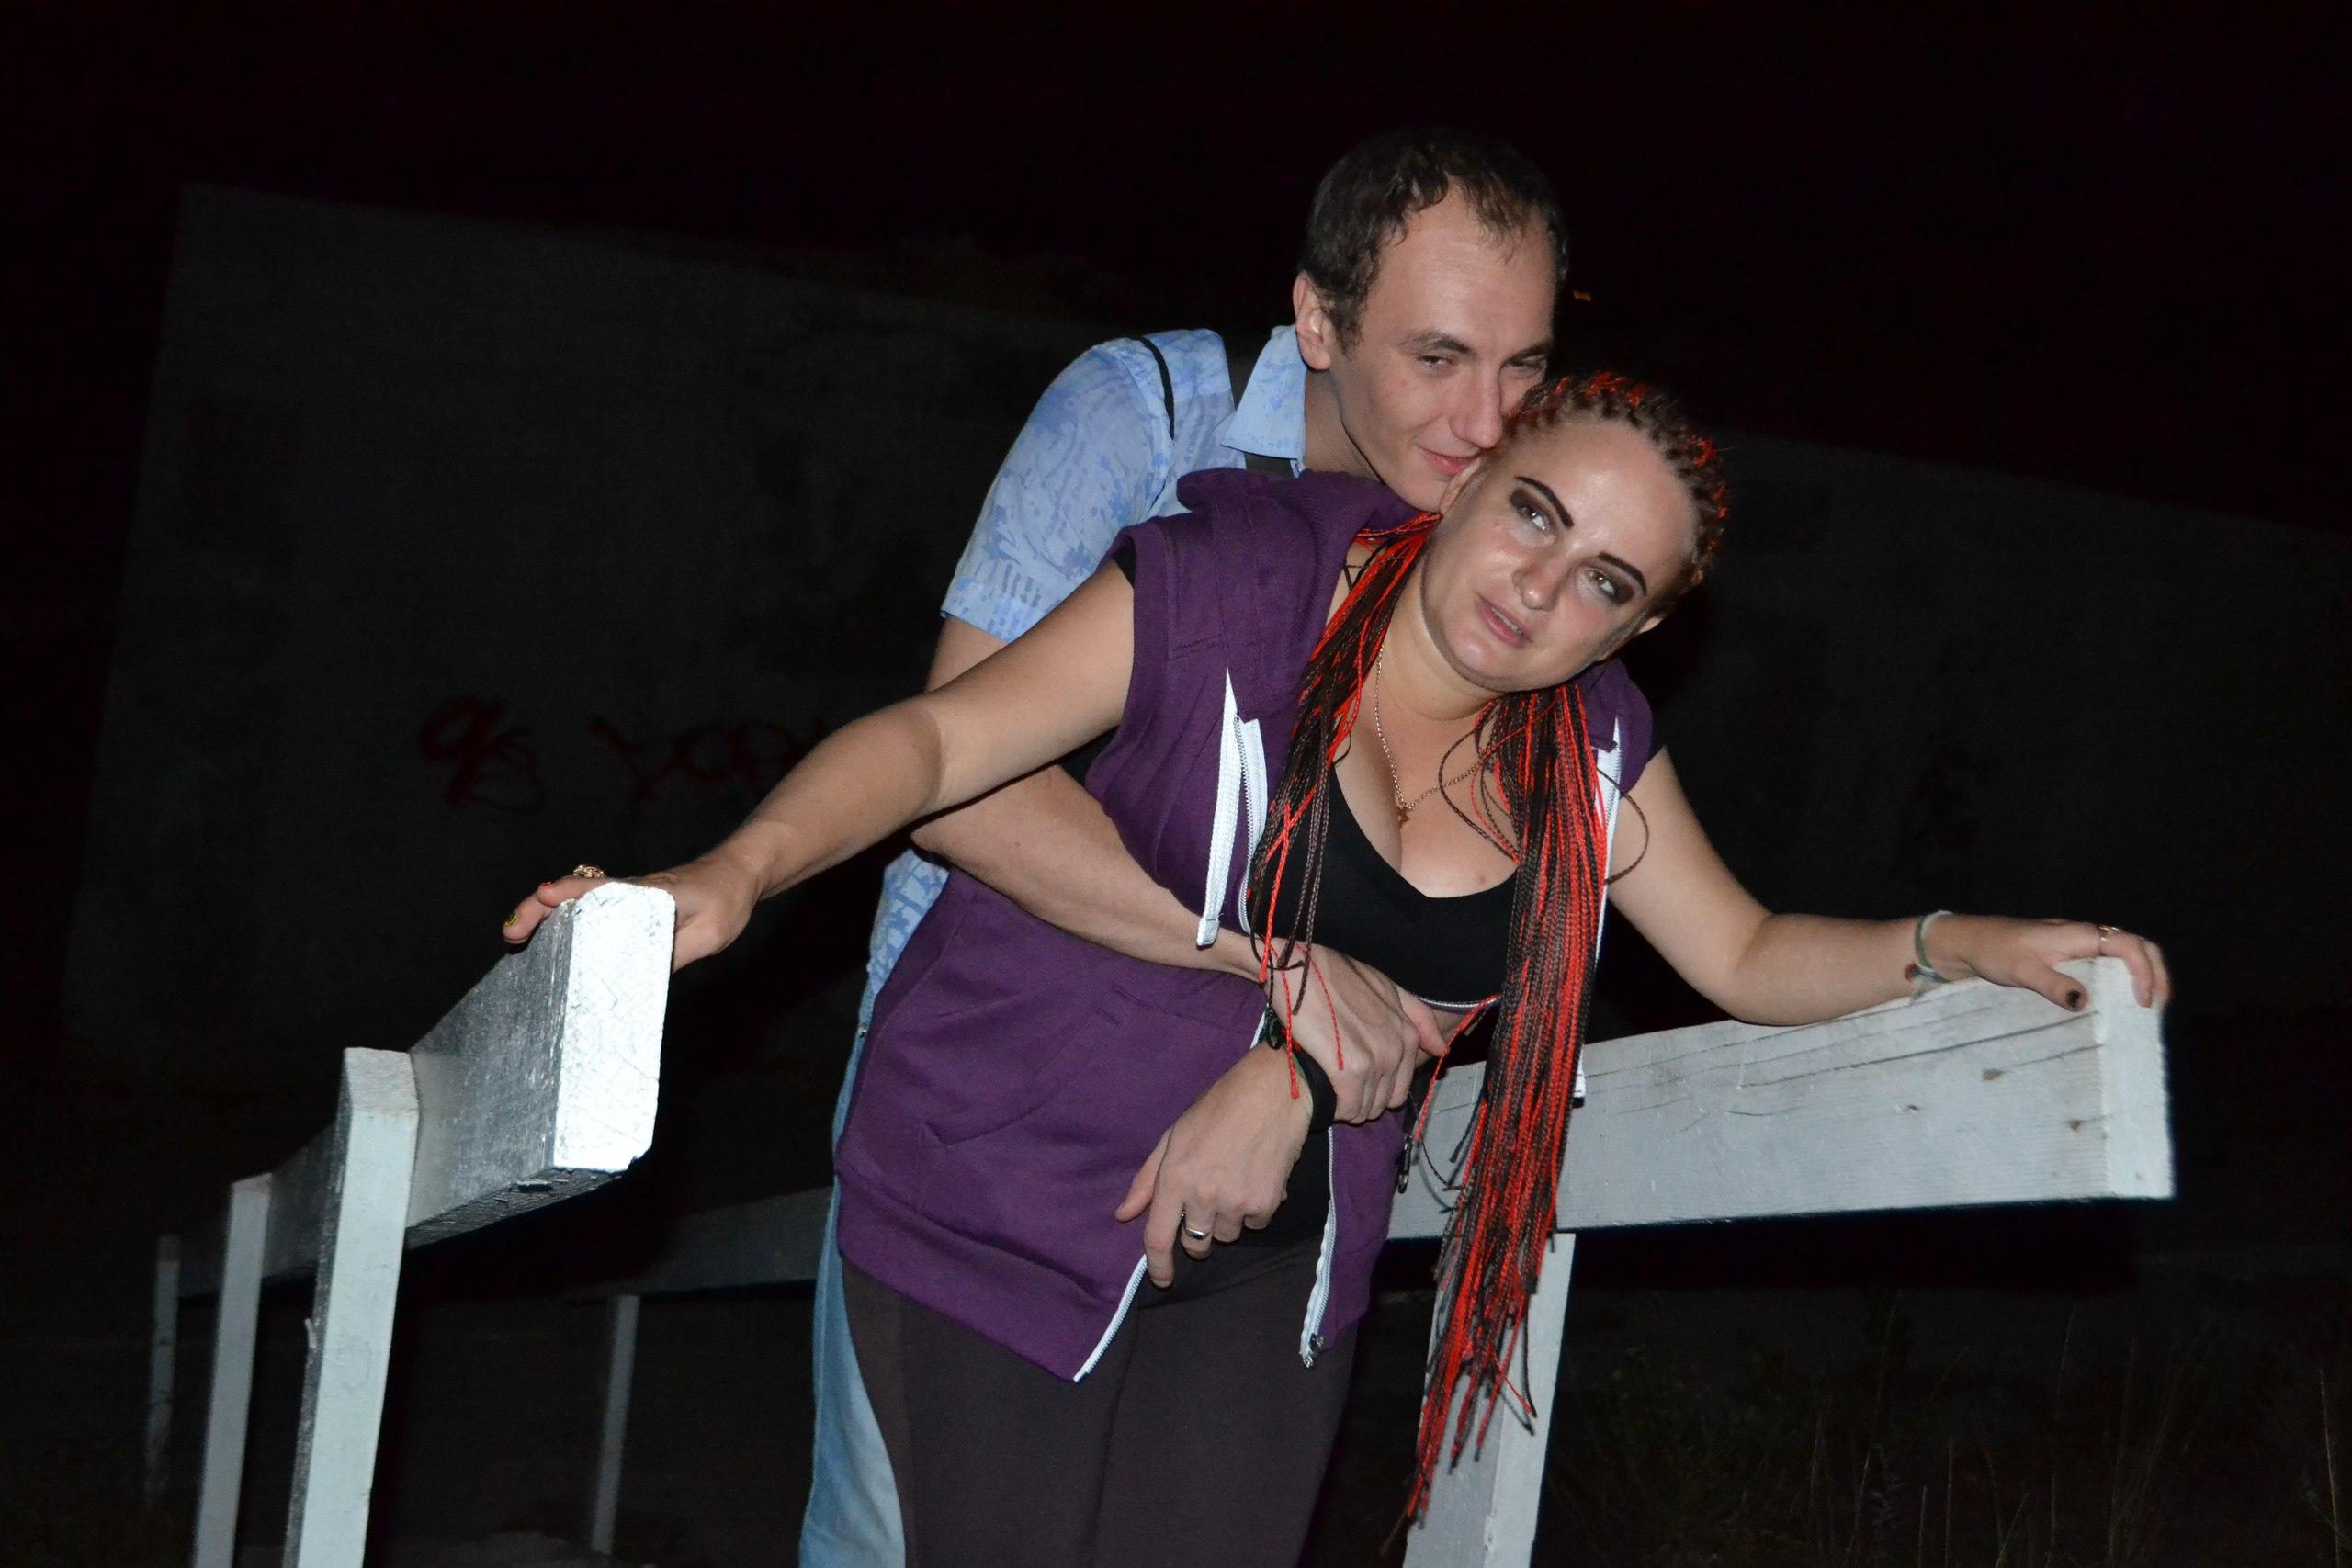 Елена Руденко (Валтея) Украина. Одесса. 17-21 августа 2016 г. - Страница 2 APvPFsvy6Hc